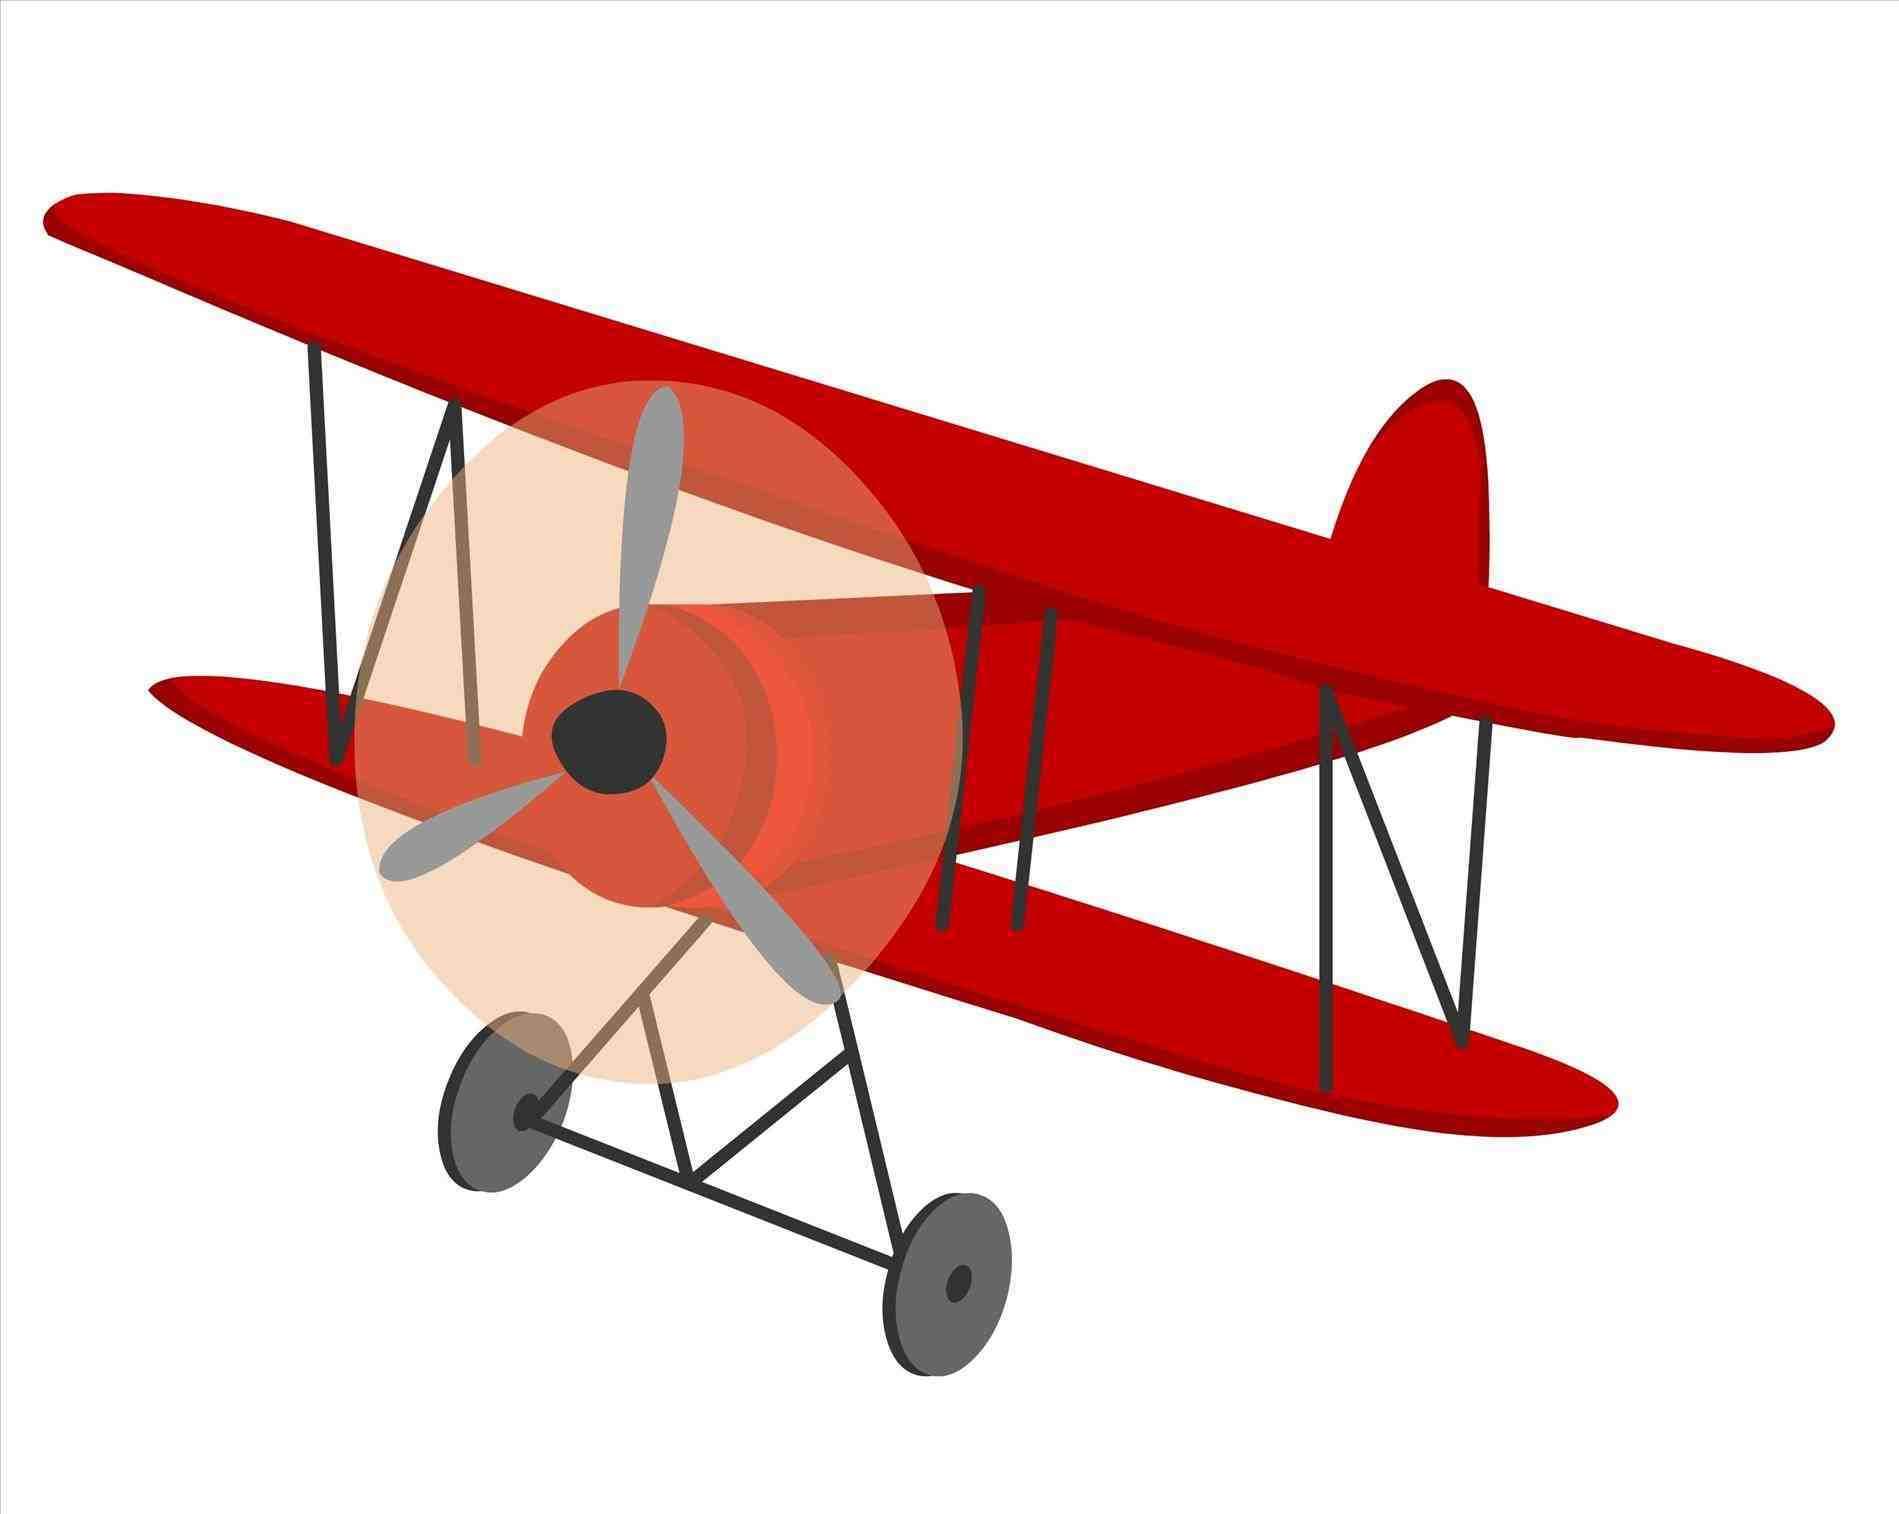 Vintage Airplane Clipart at GetDrawings | Free download